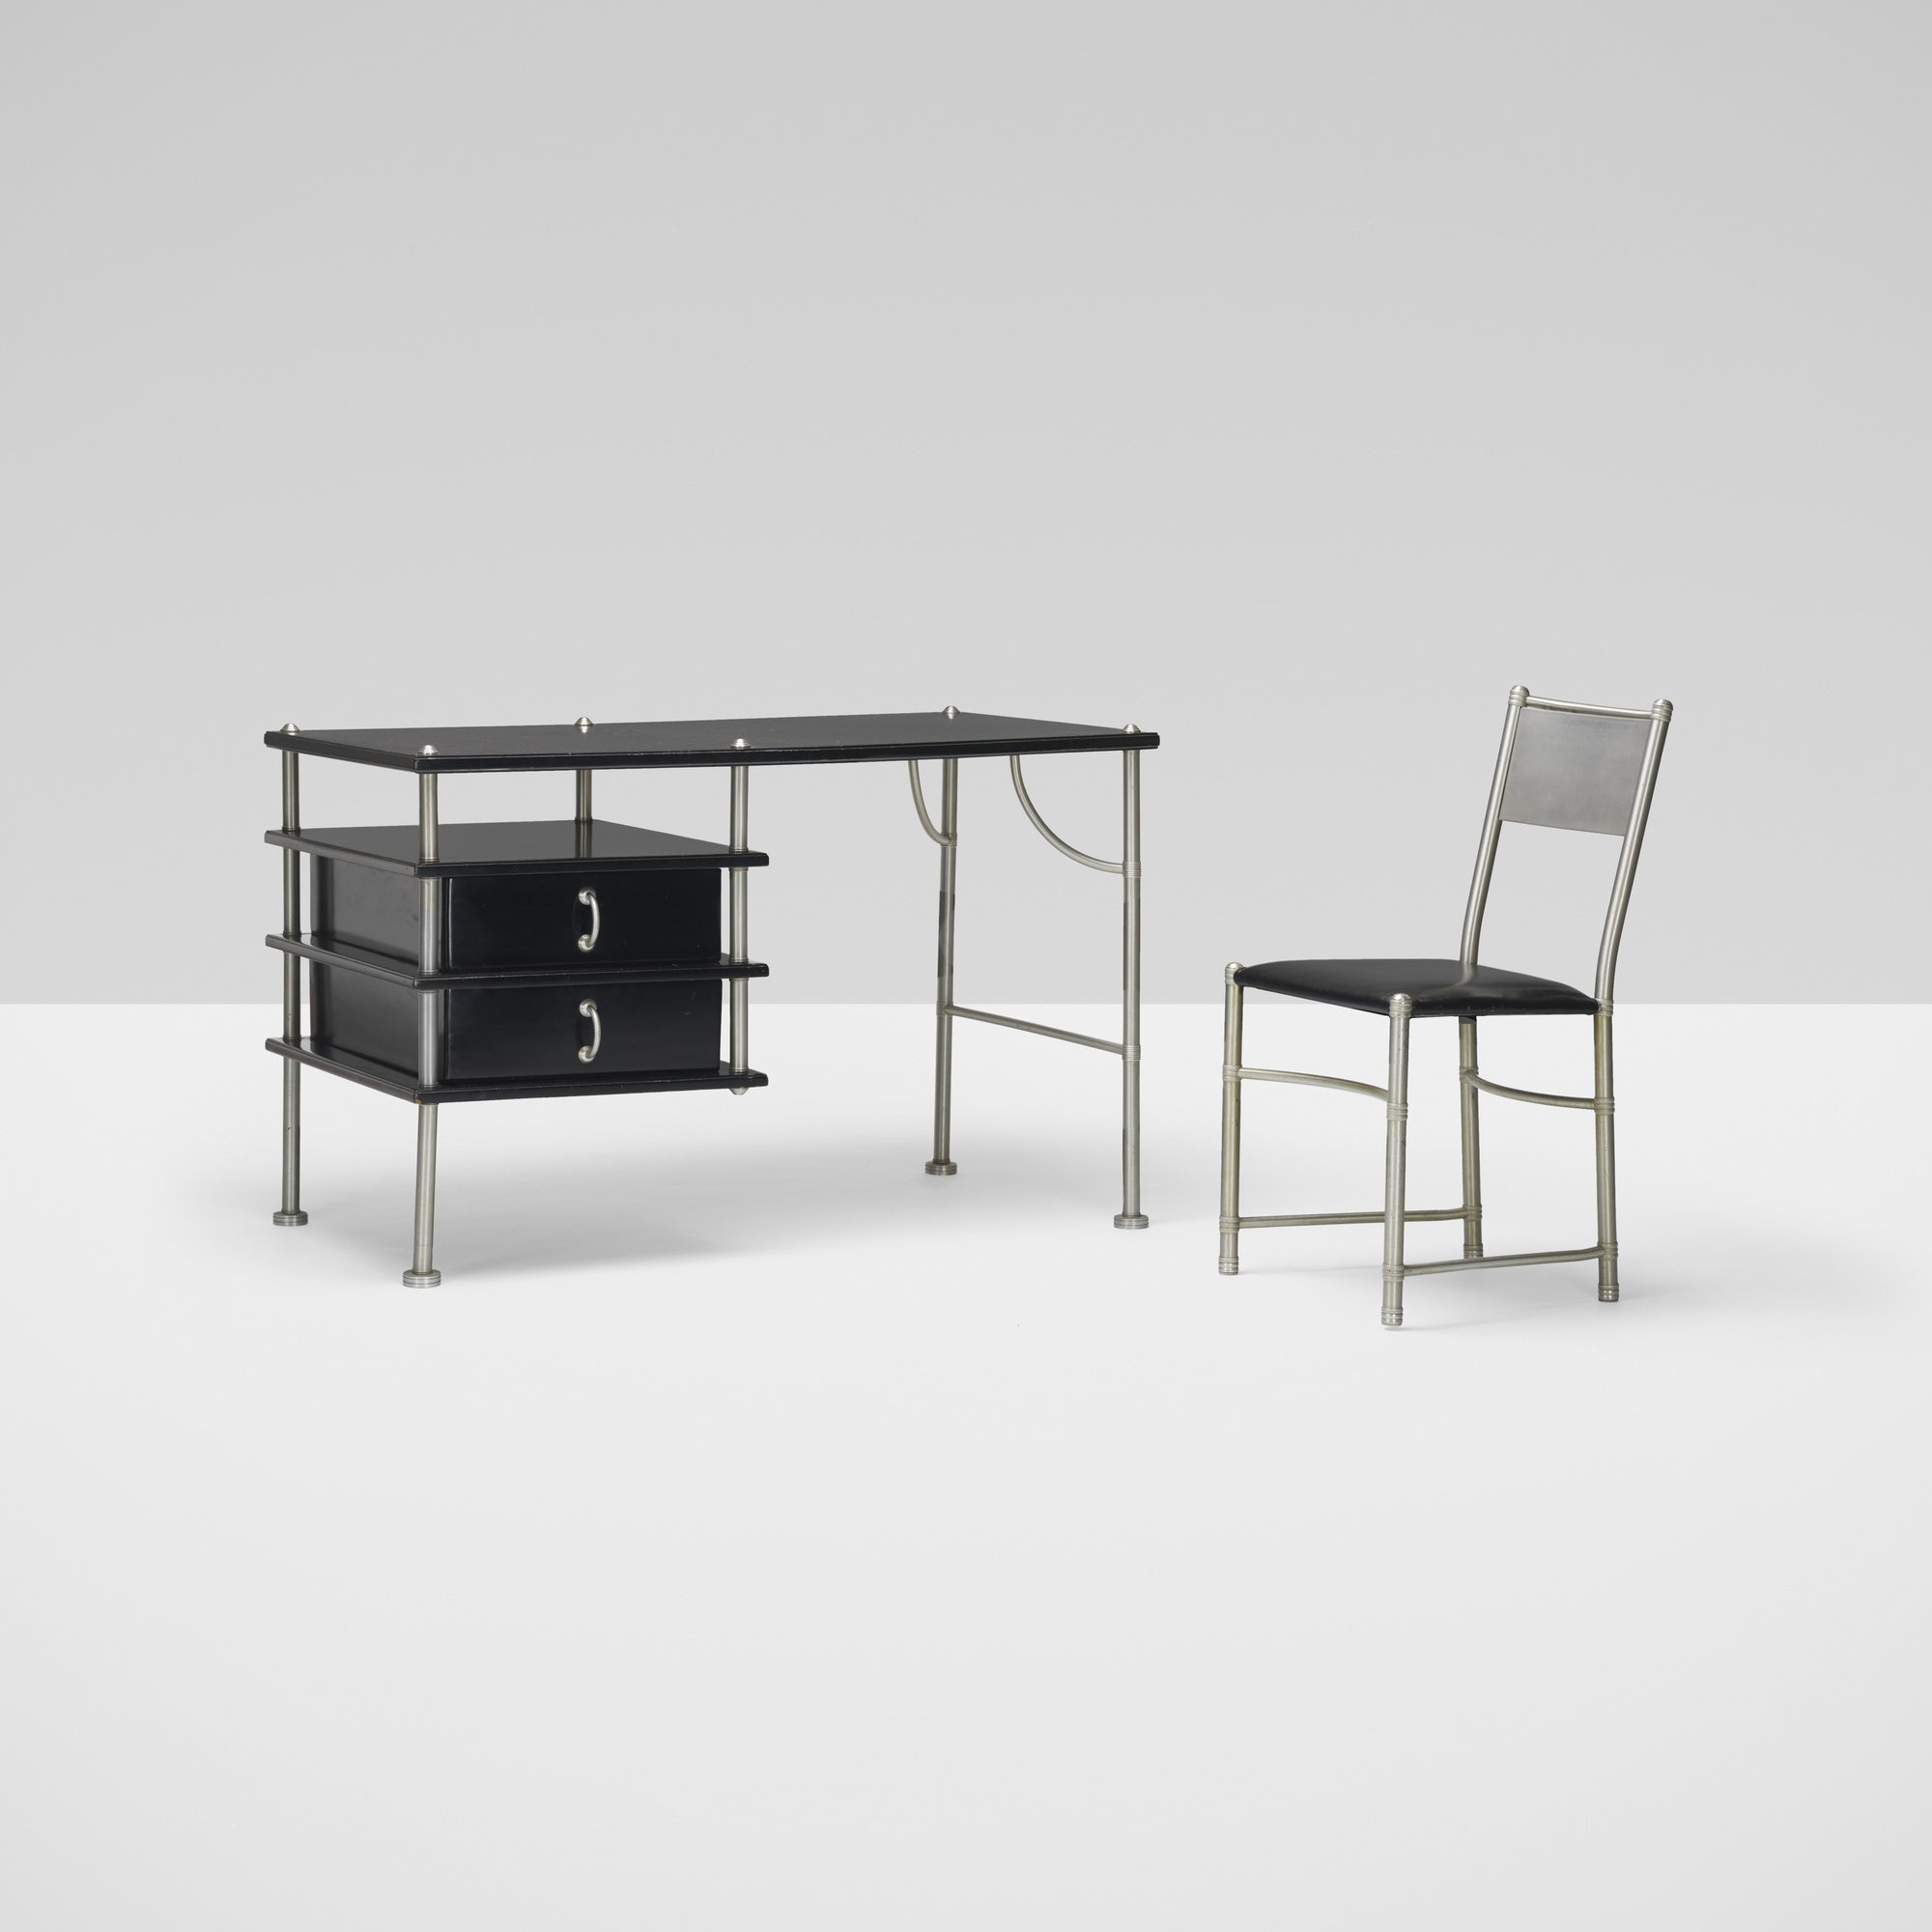 261: Warren McArthur / desk and chair, model 1111 (1 of 3)